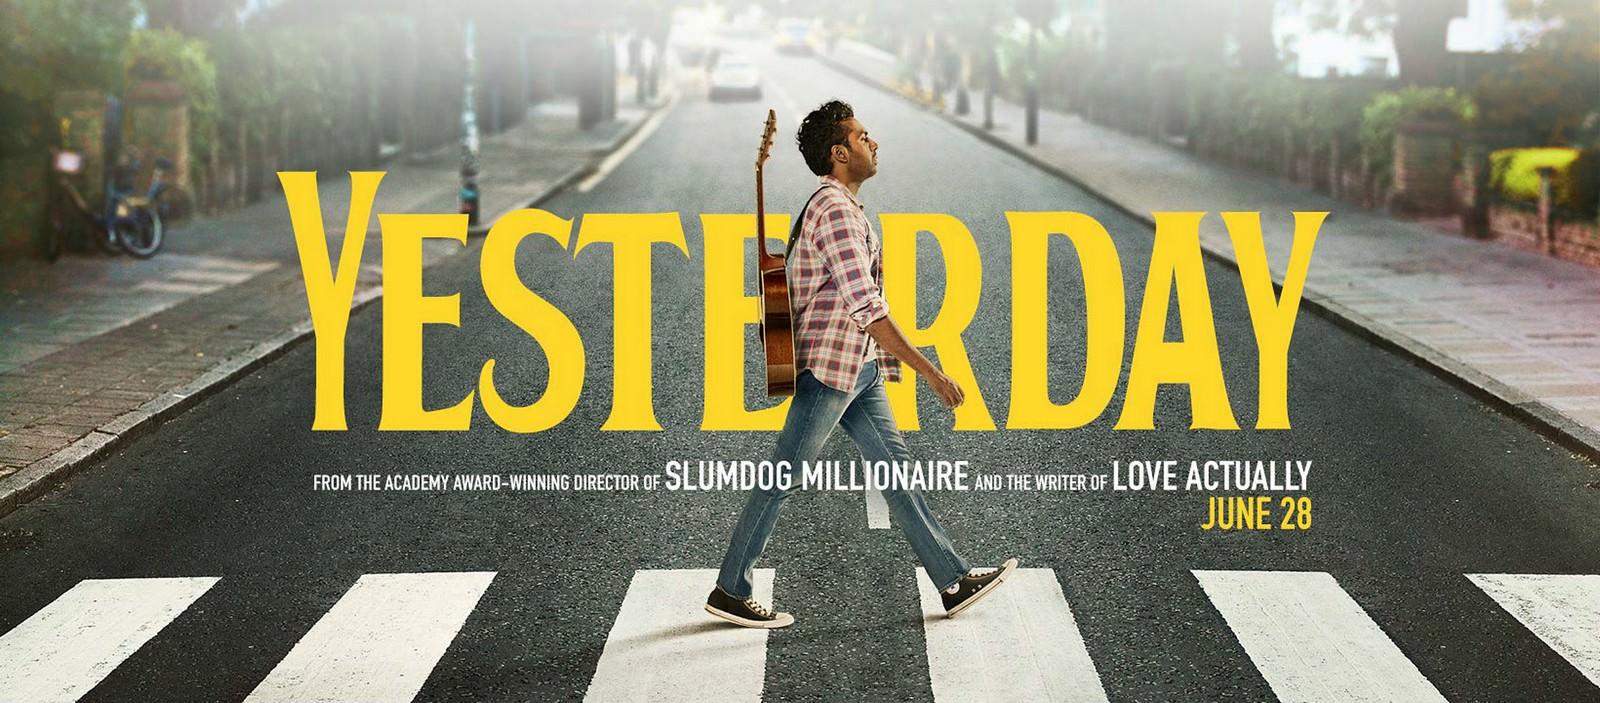 Movie, Yesterday(英國, 2019年) / 靠譜歌王(台灣) / 昨日奇迹(中國) / 緣來自昨天(香港), 電影海報, 英國, 橫版